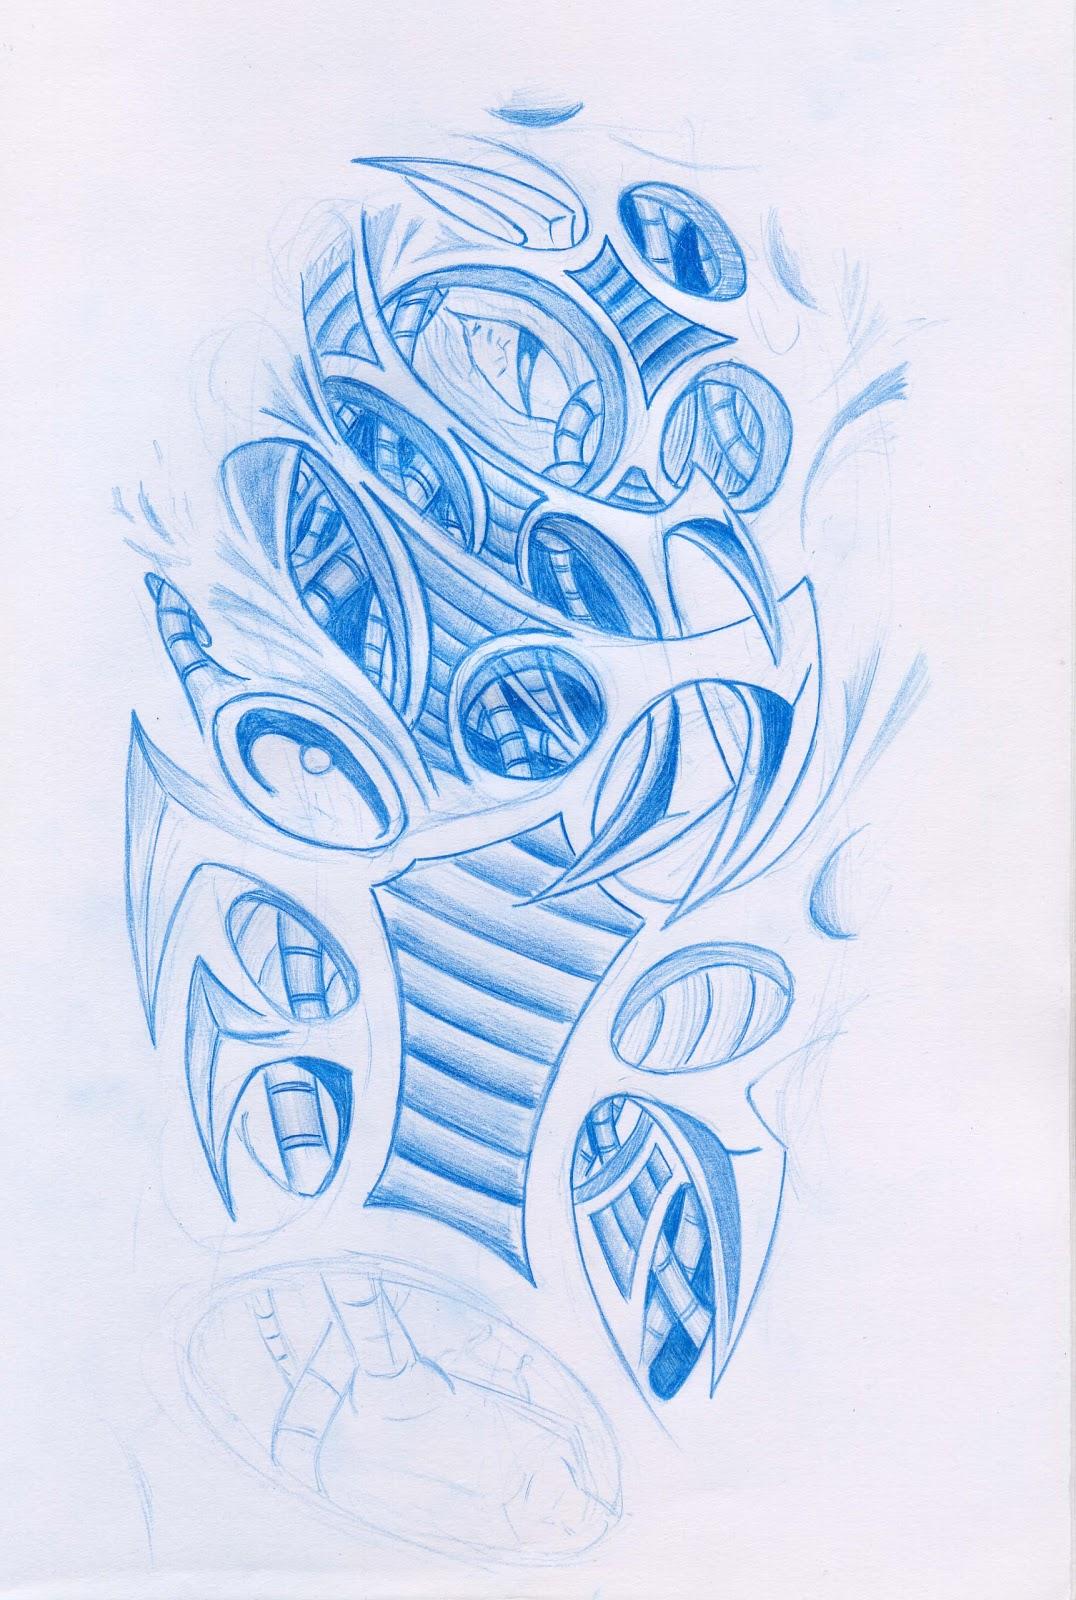 Biomechanical Tattoo Line Drawing : Biomechanical tattoos tukang kritik